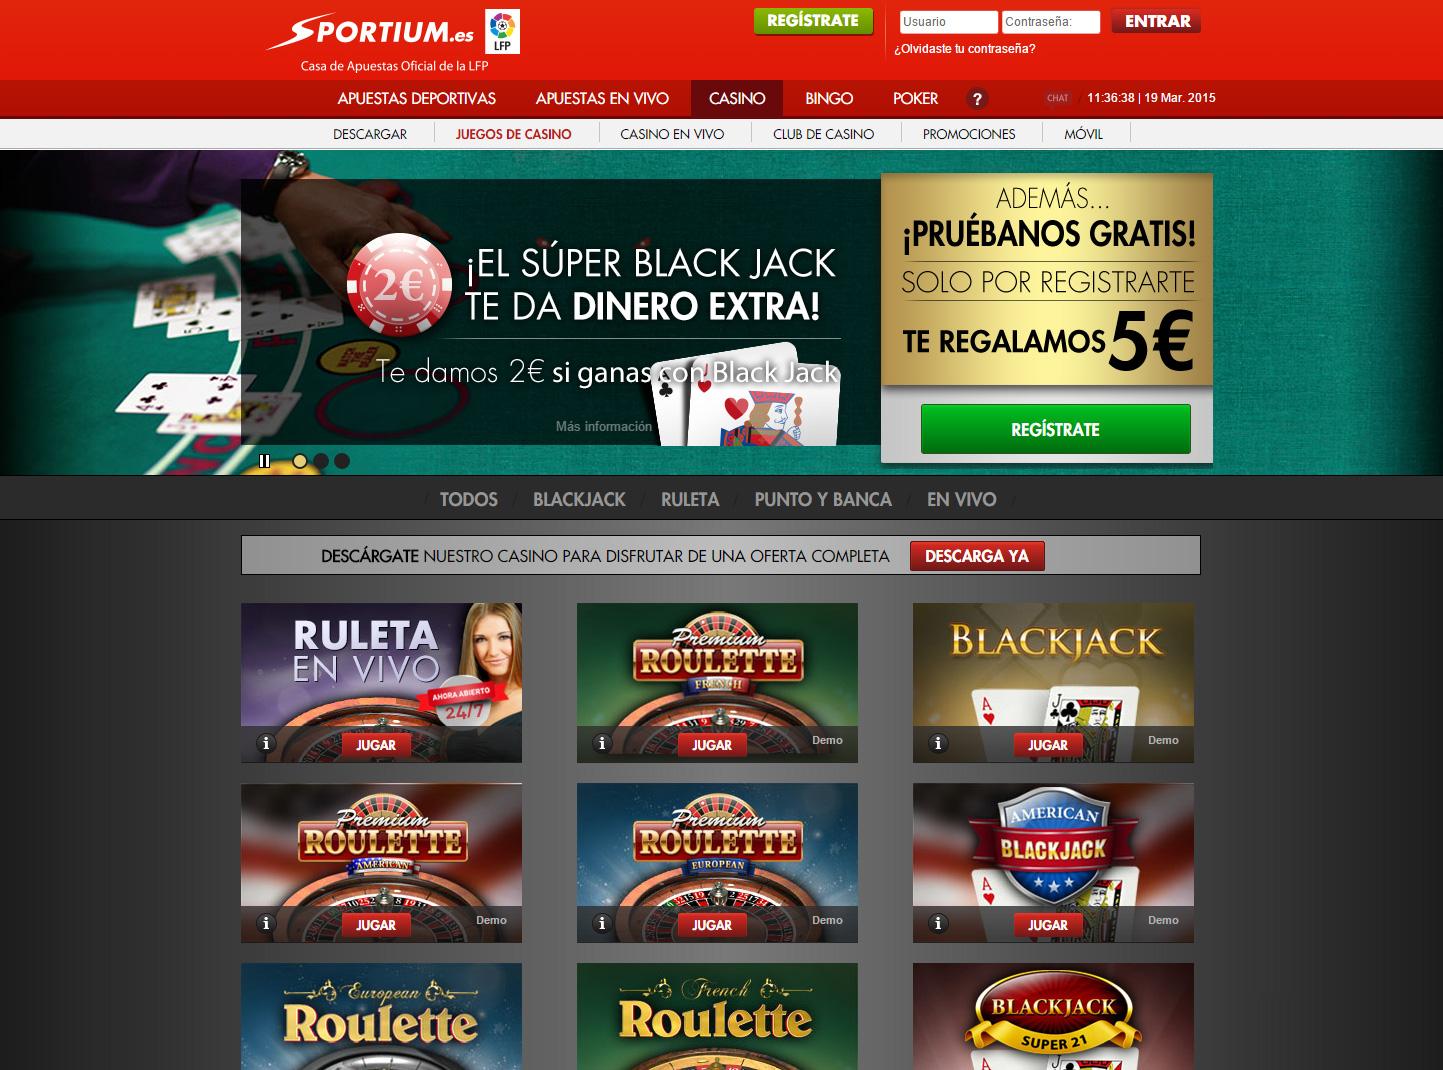 Mundiales de Poker jugar bingo online gratis en español-687827